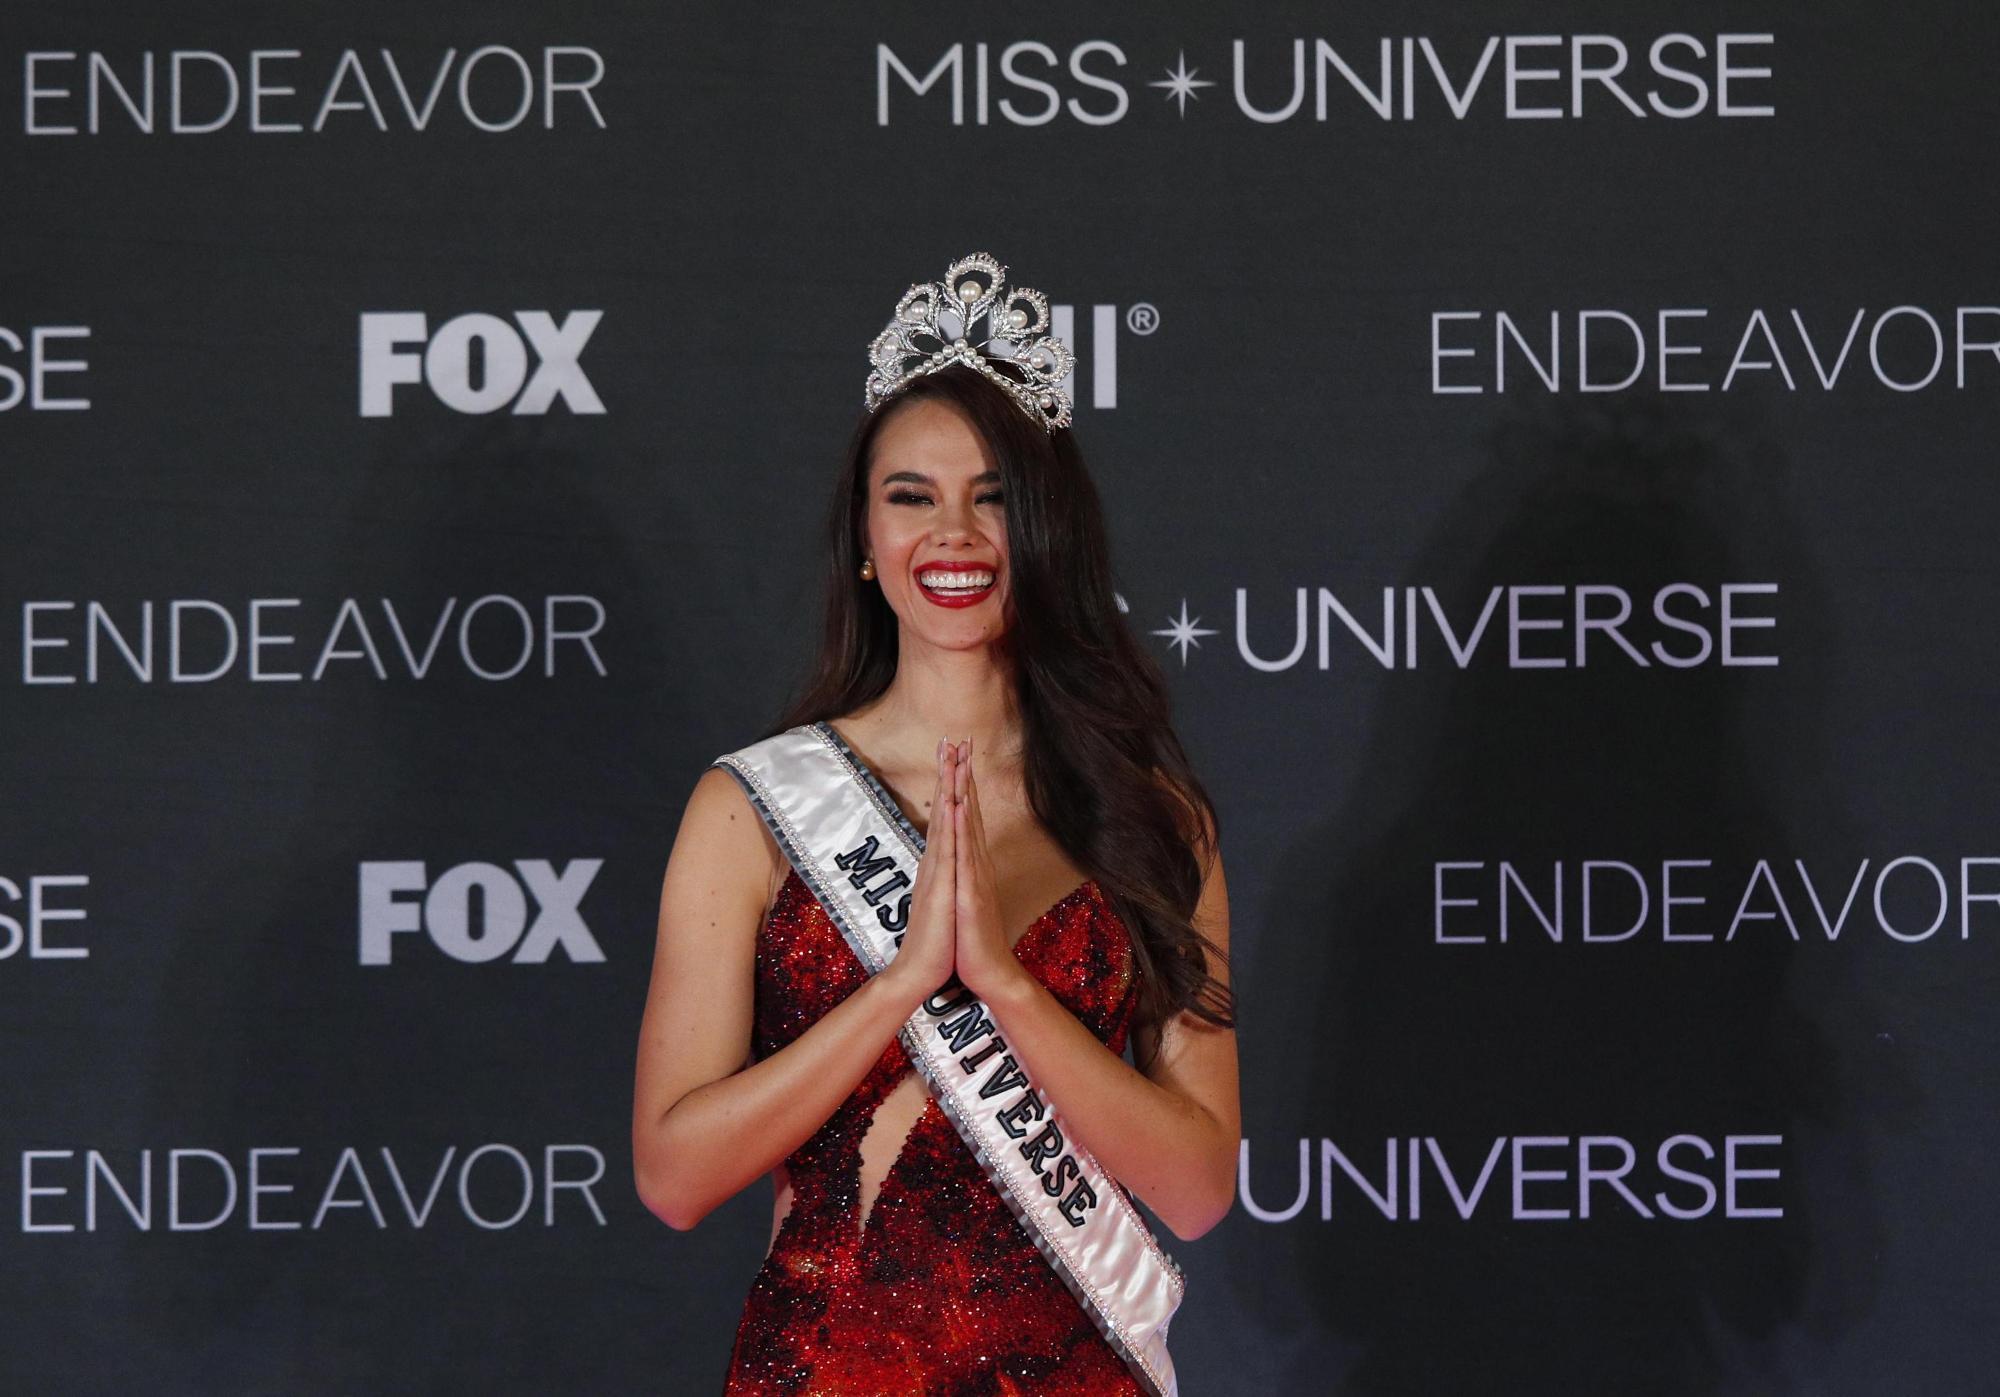 Miss Universo sesso video